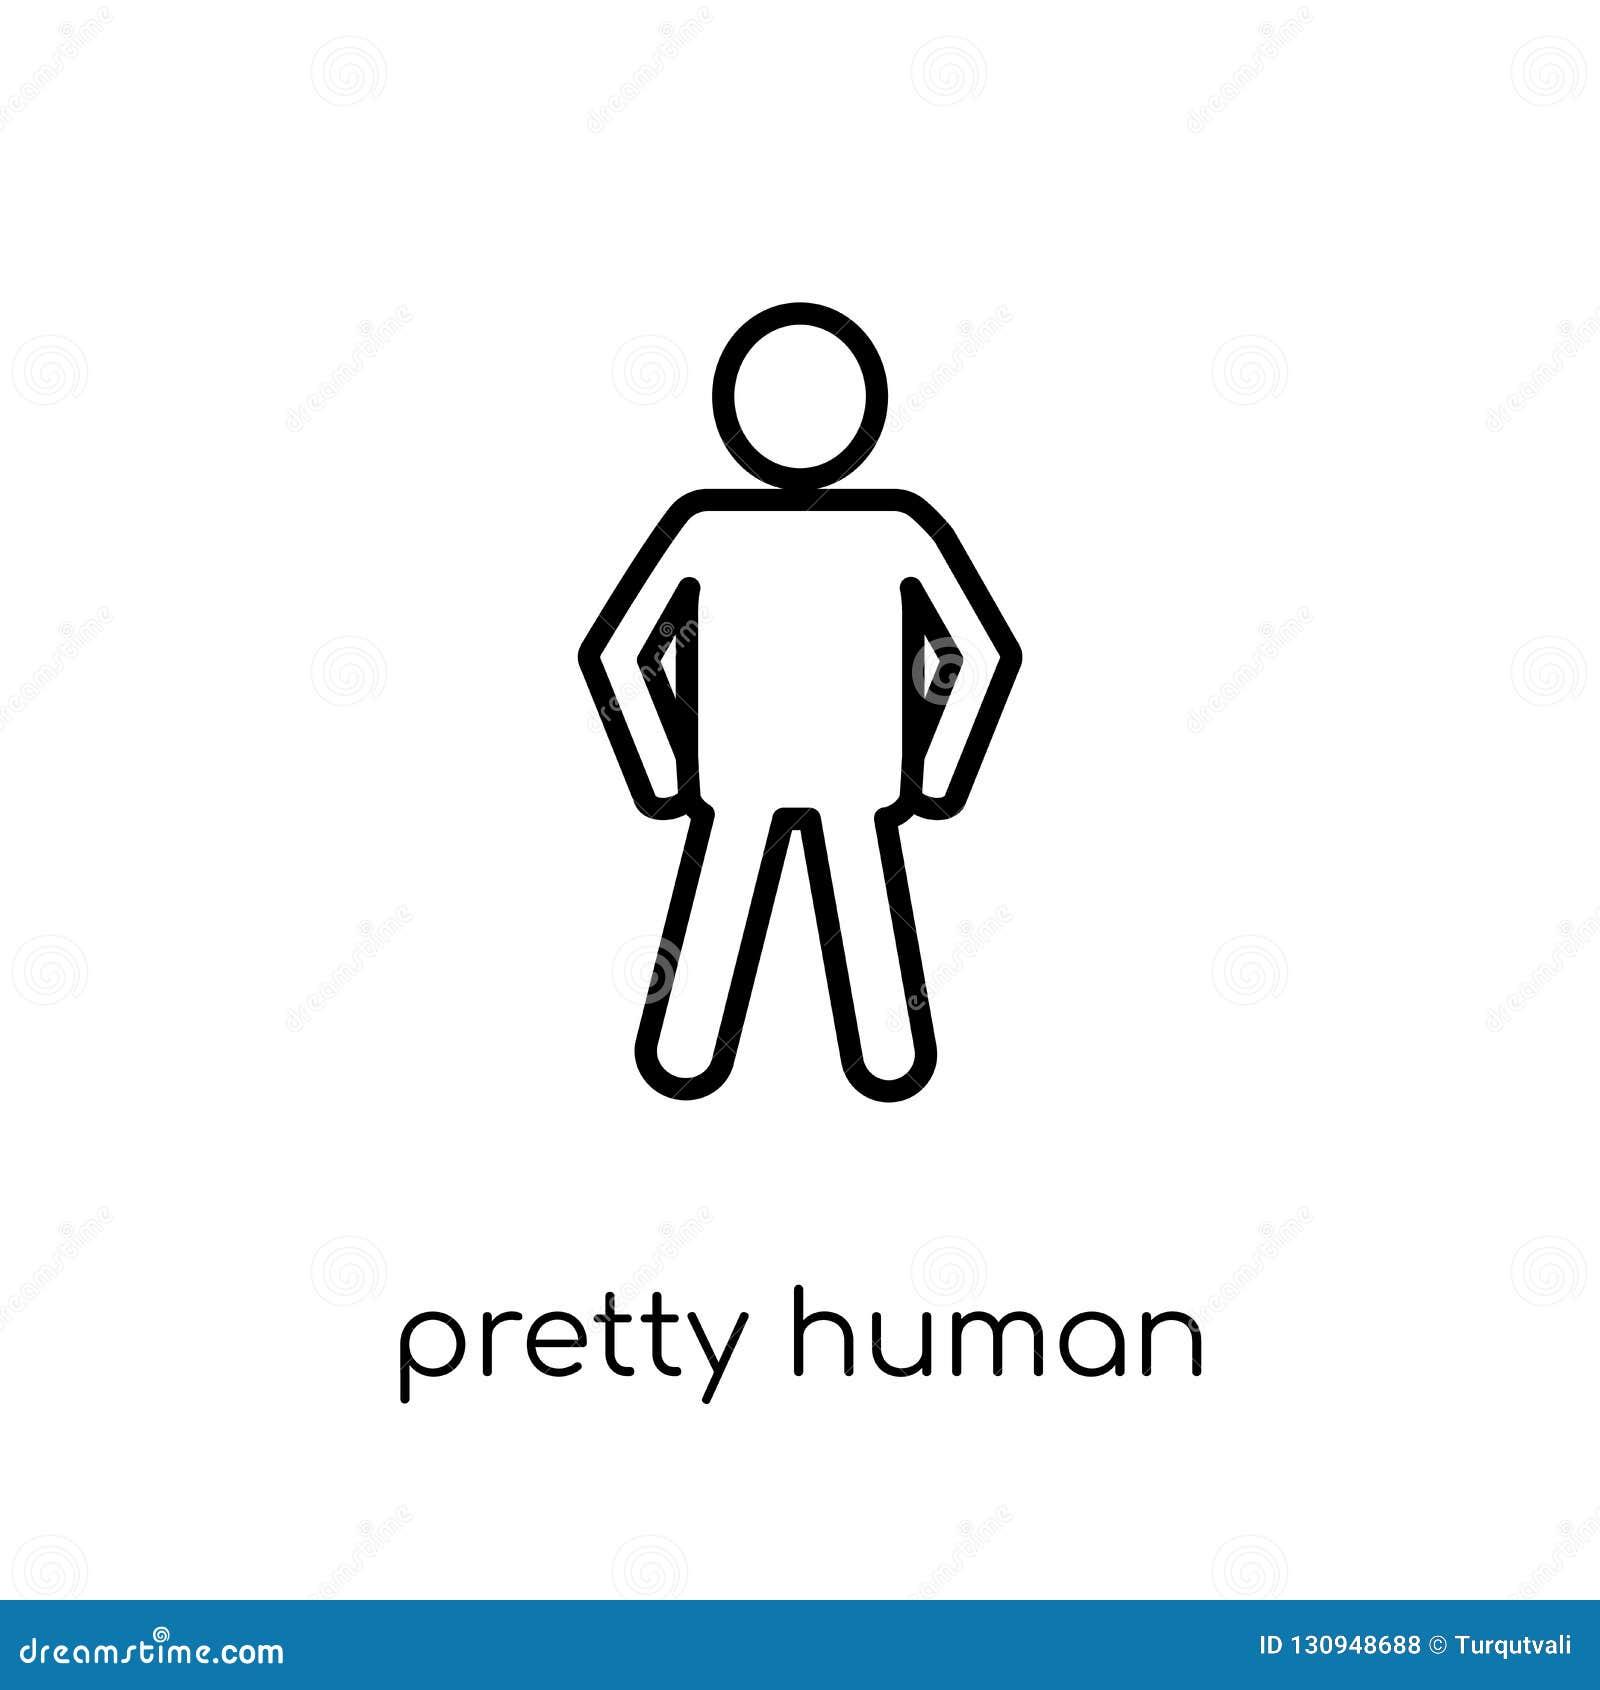 Icono humano bonito Vector linear plano moderno de moda bastante humano